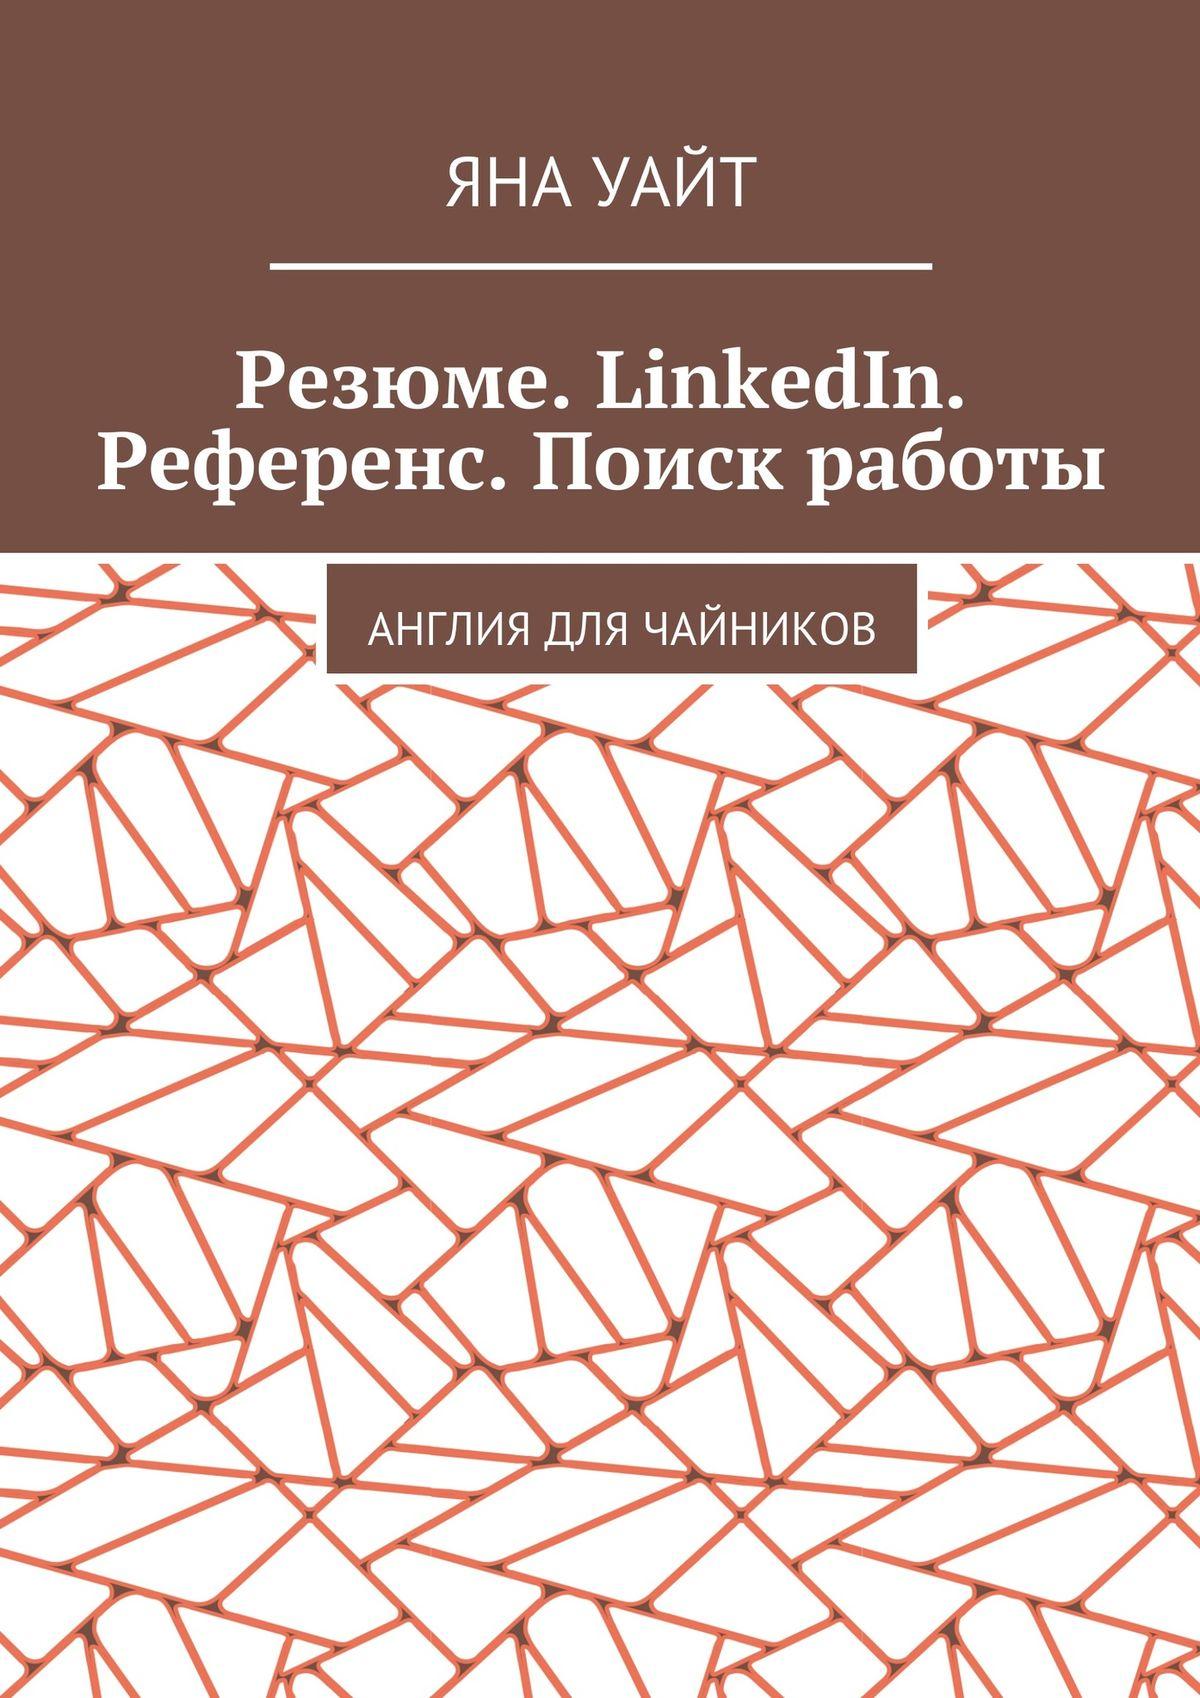 Резюме. LinkedIn. Референс. Поиск работы